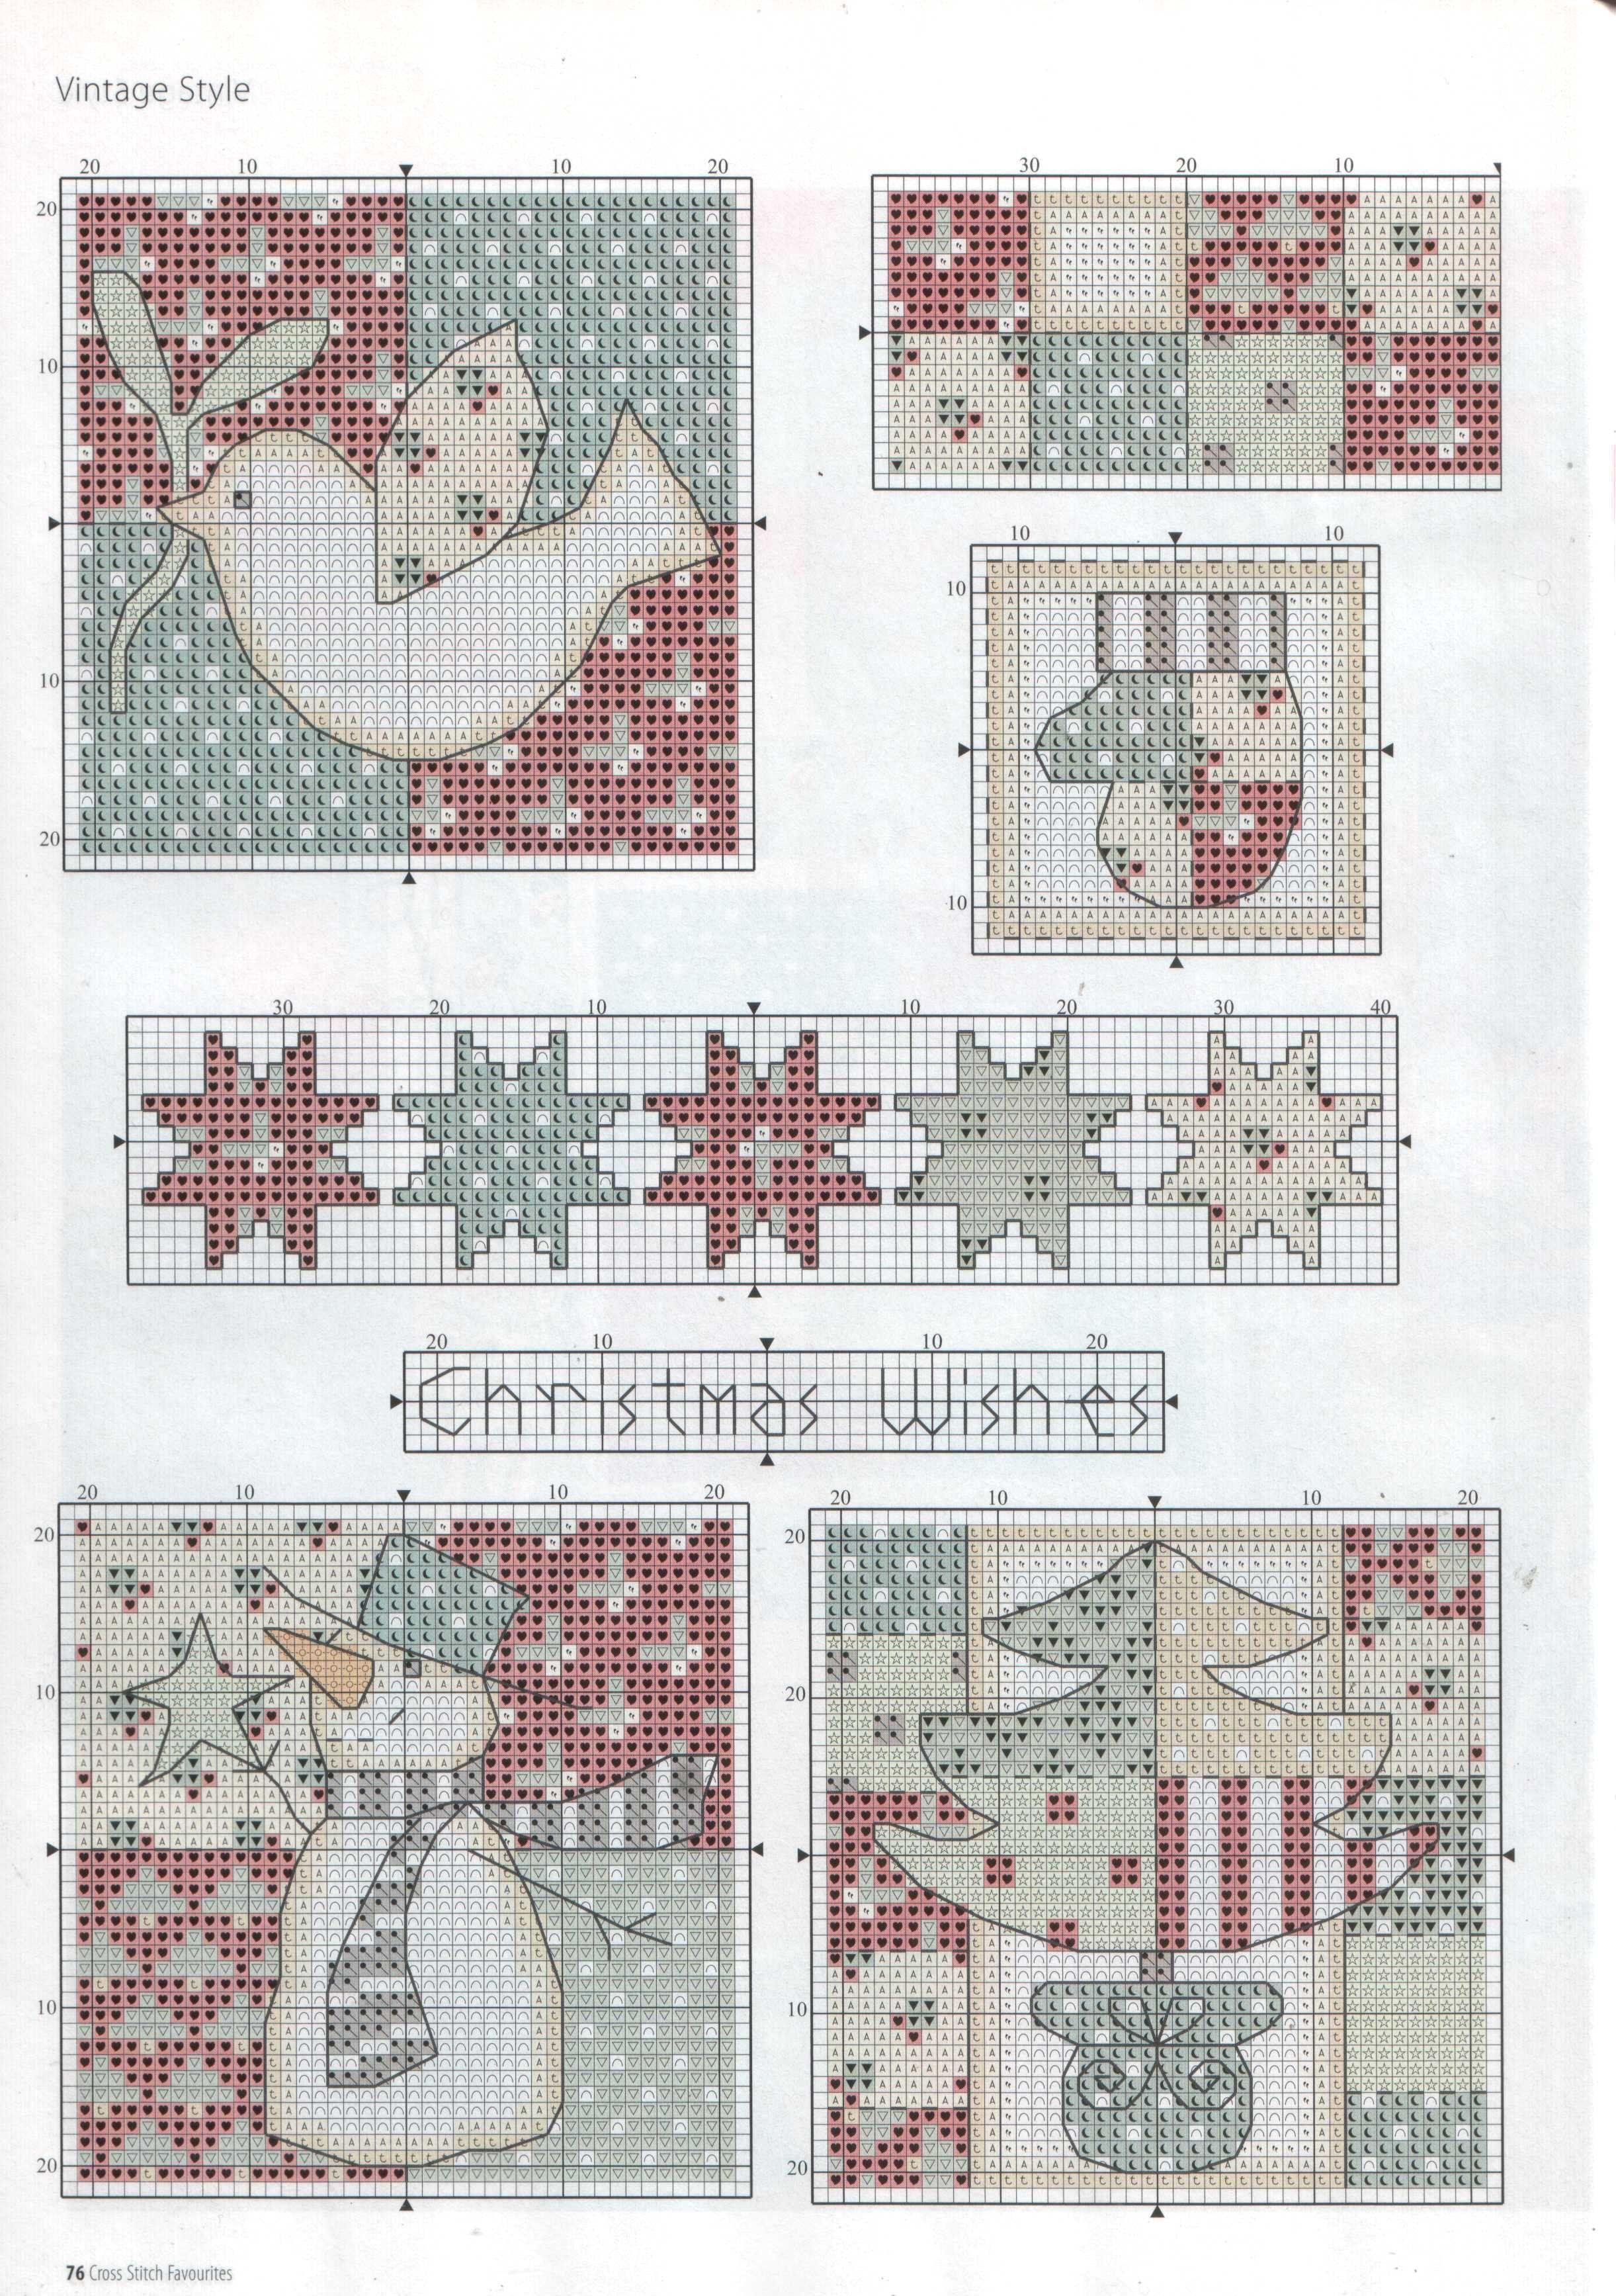 imgbox - fast, simple image host | Navidad | Punto de cruz navidad ...